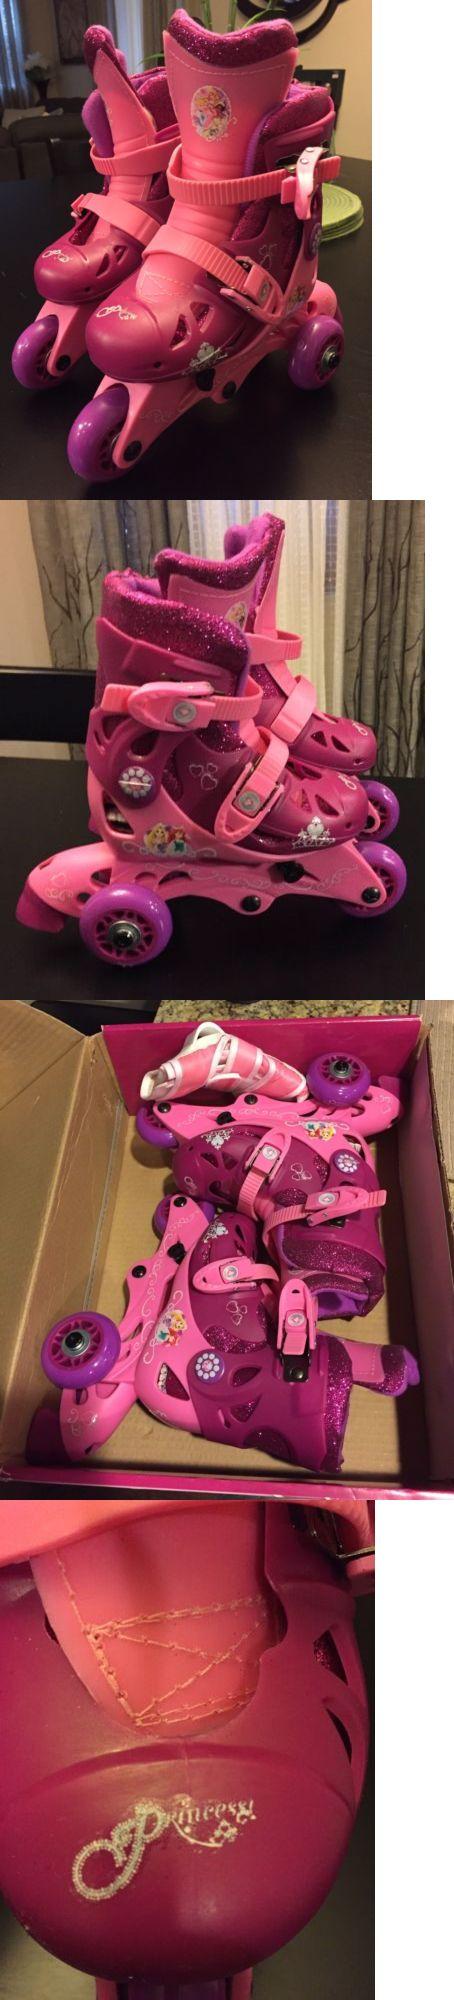 Indoor Roller Skating 165938: Playwheels Disney Princess Glitter Kids Convertible 2-In-1 Skates-Toddler Sz 6-9 -> BUY IT NOW ONLY: $45.99 on eBay!